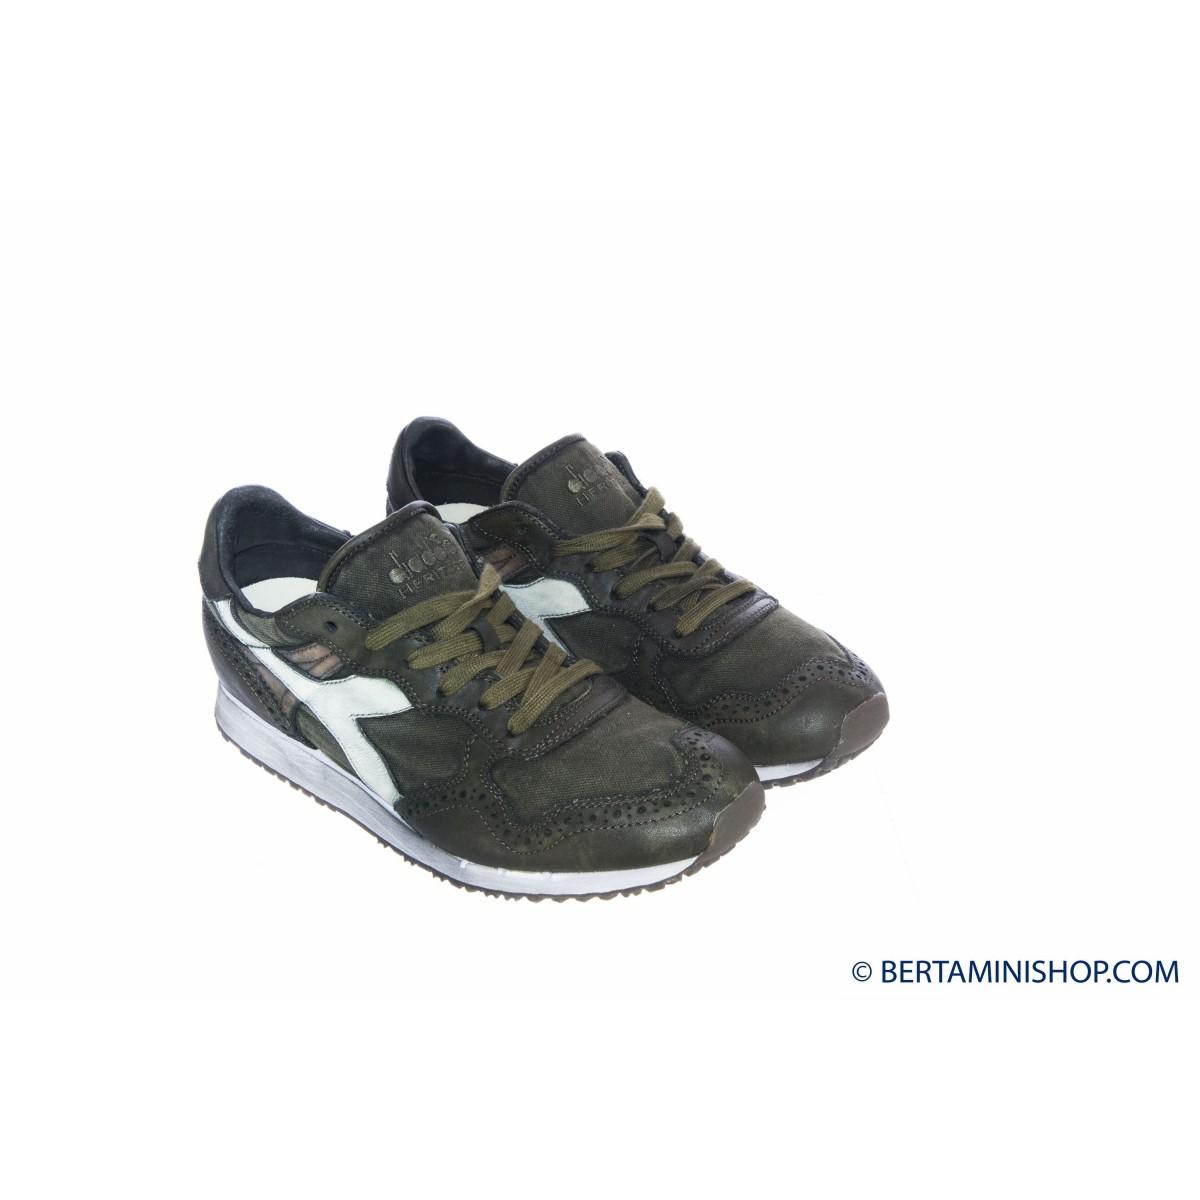 Schuhen Diadora Manner - Trident C Dyed Brogue 70429 - Kiwi Green